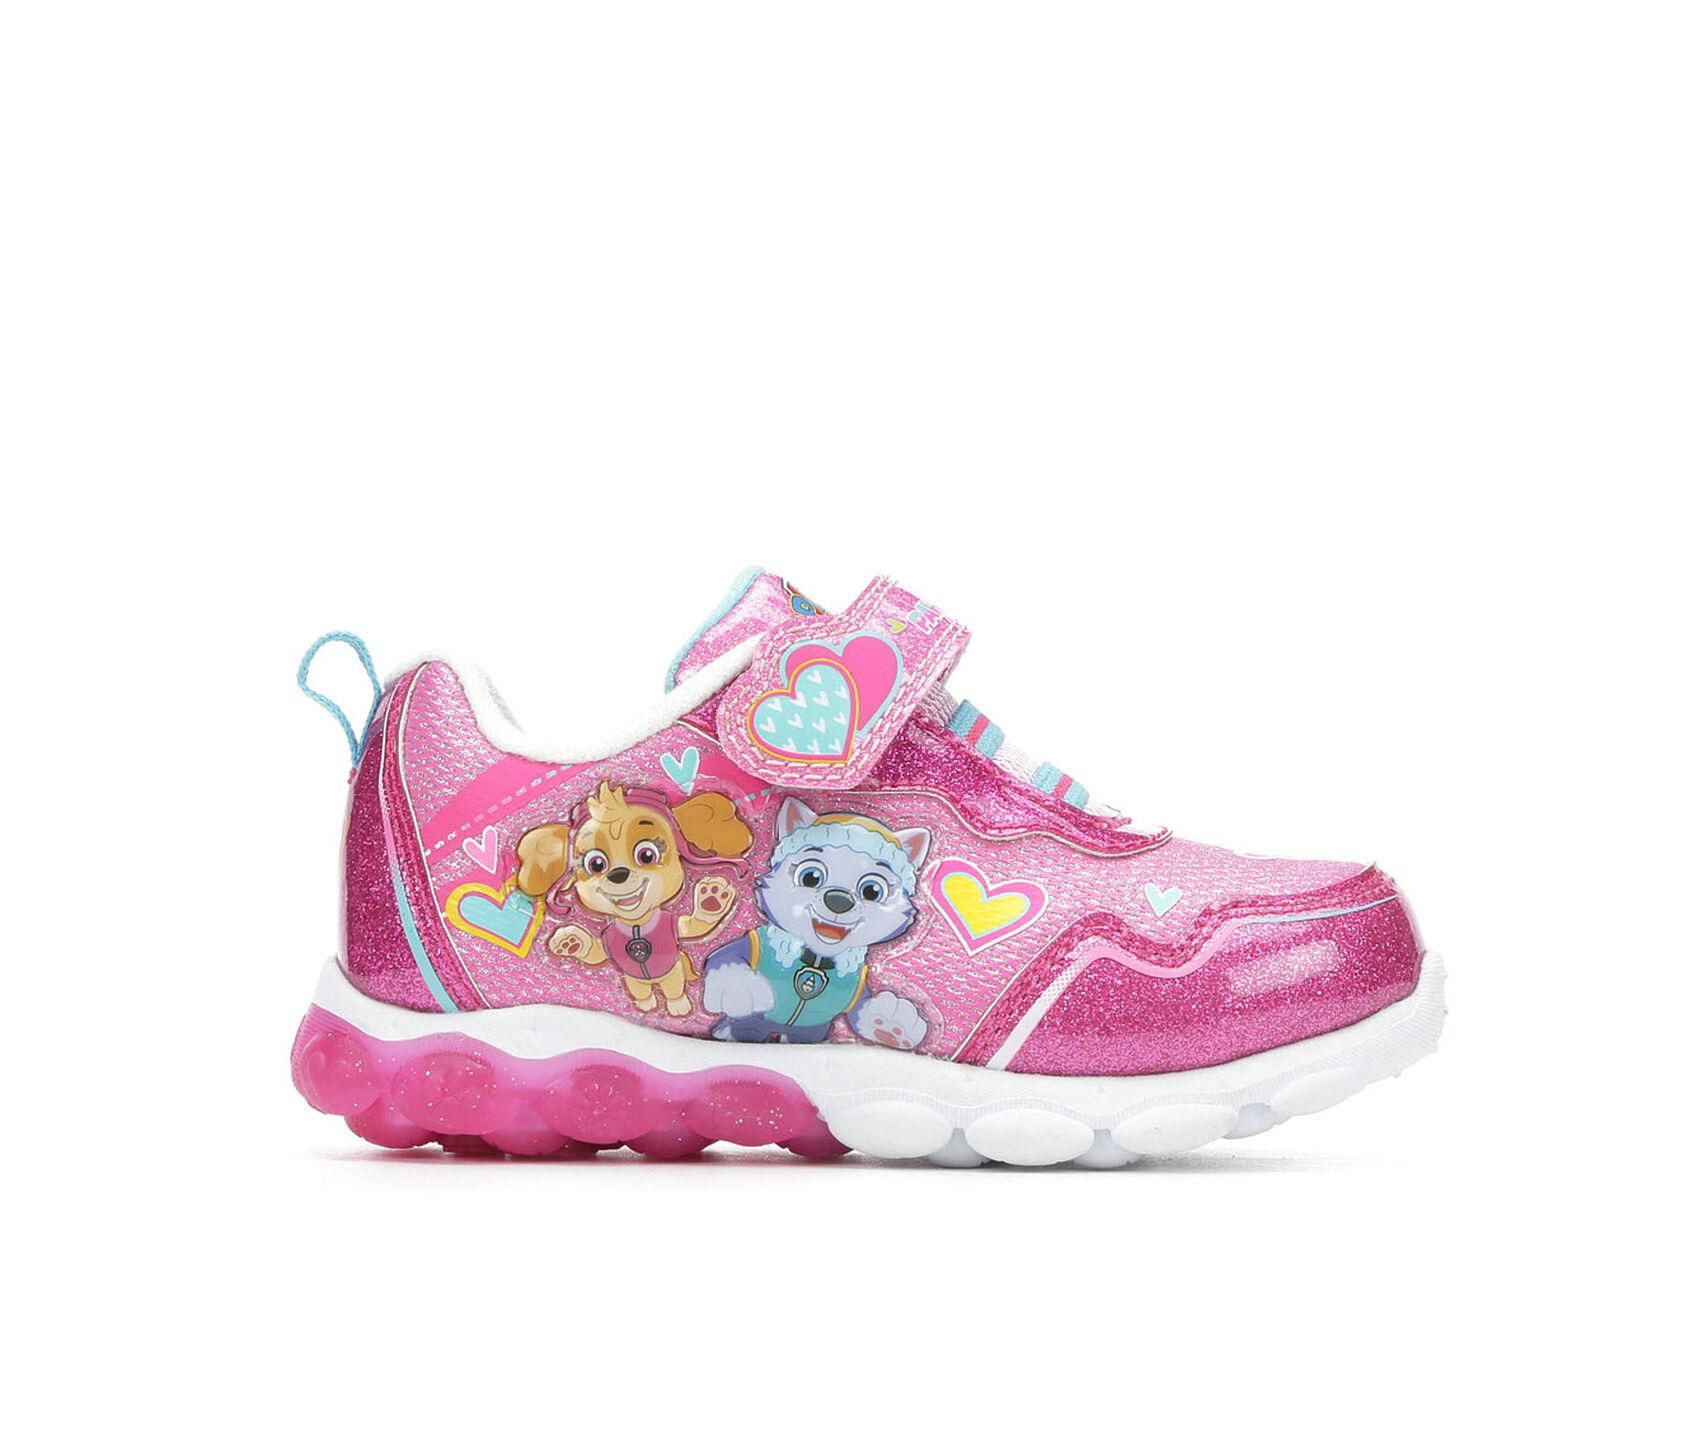 9d6d3338cead7 Girls' Nickelodeon Toddler & Little Kid Paw Patrol 7 Light-Up ...